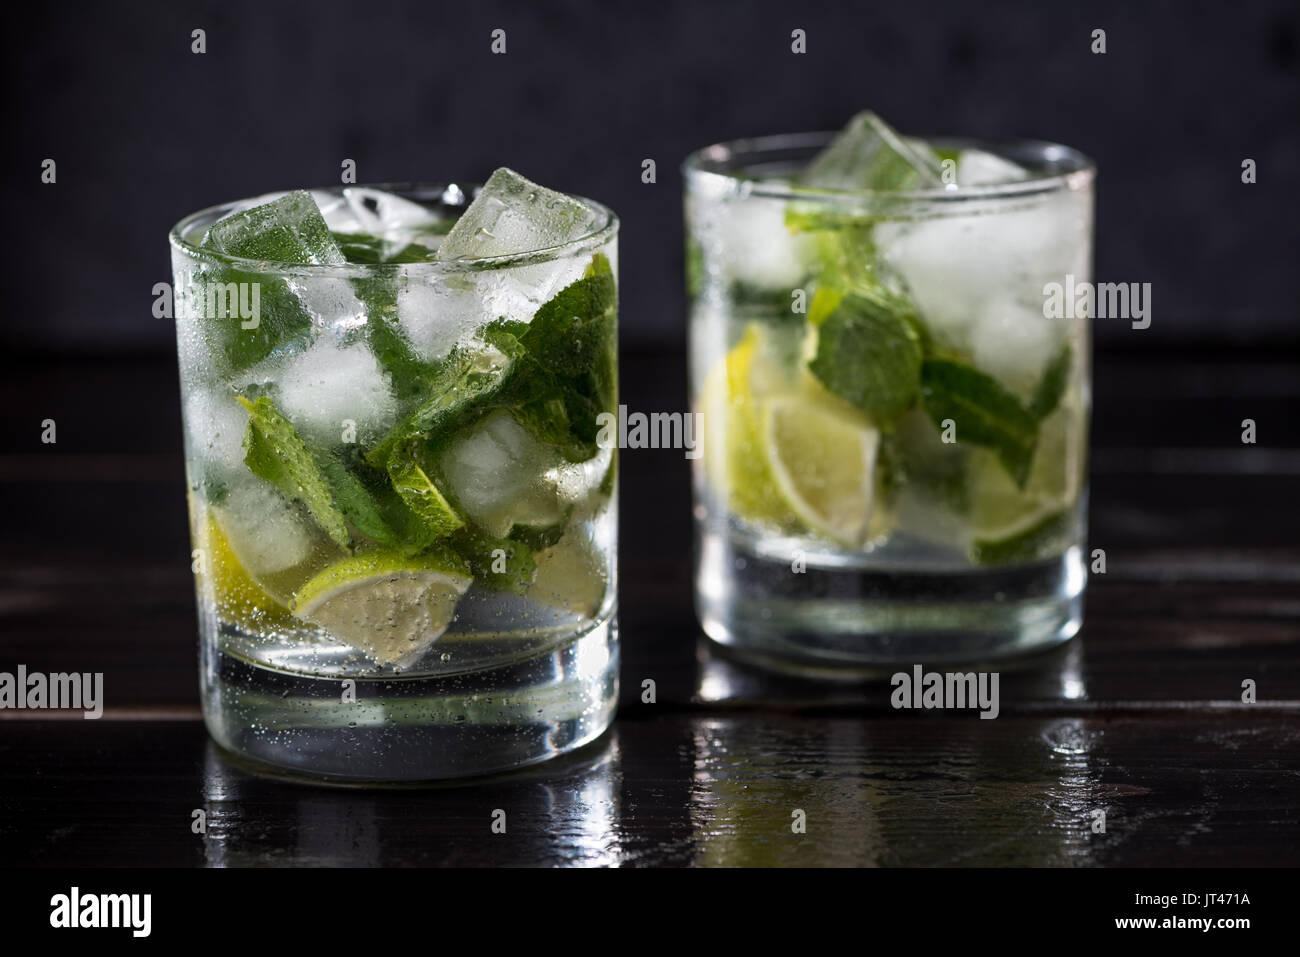 Vista cercana del cóctel mojito en vidrios sobre la mesa de madera oscura, cóctel de bebidas concepto Imagen De Stock